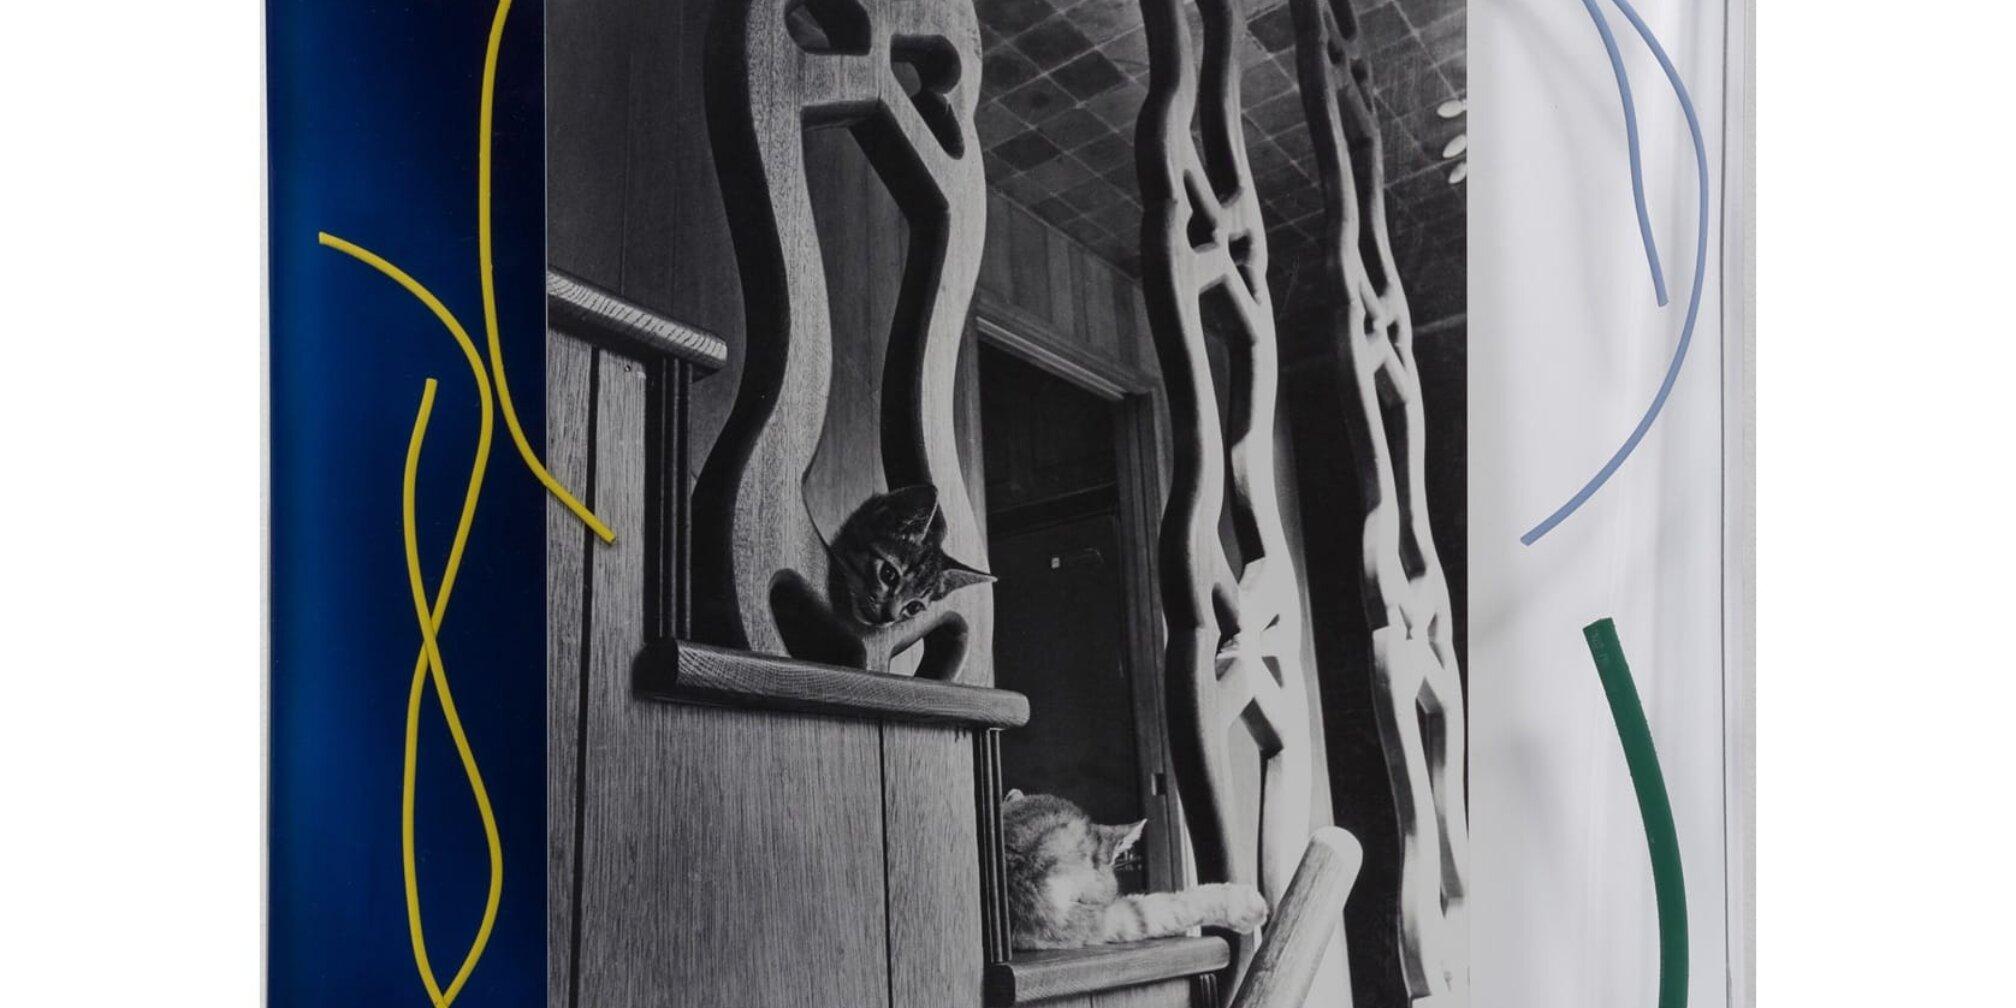 Elad Lassry, Untitled (Two Cats), 2014. Photo: Fredrik Nilson Studio